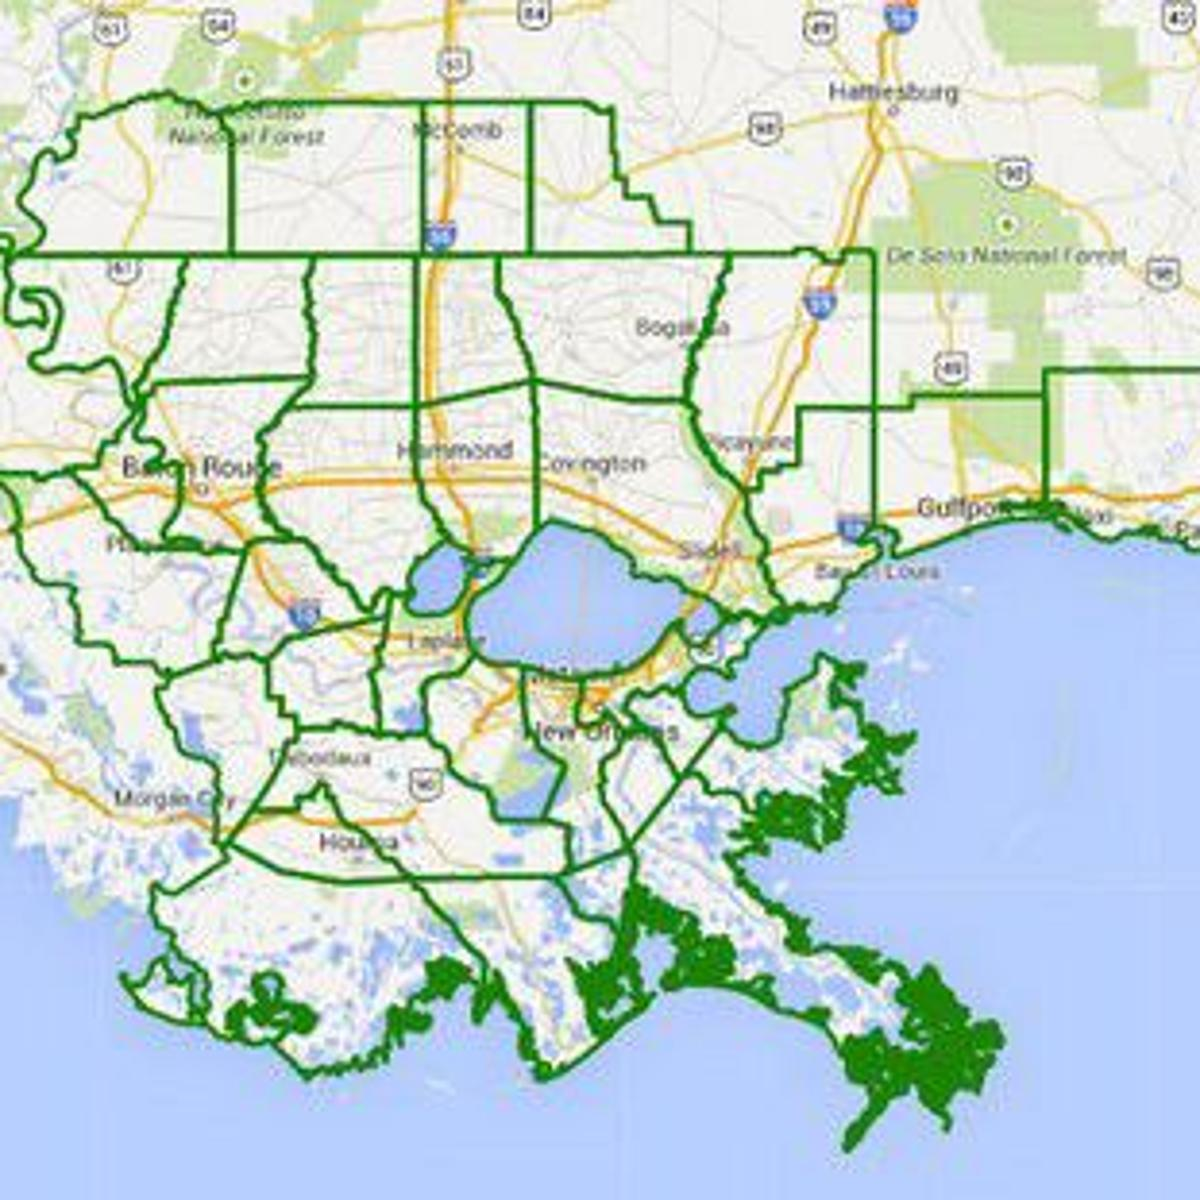 map of southeast louisiana Flood Watch For Southeast Louisiana Southern Mississippi From map of southeast louisiana